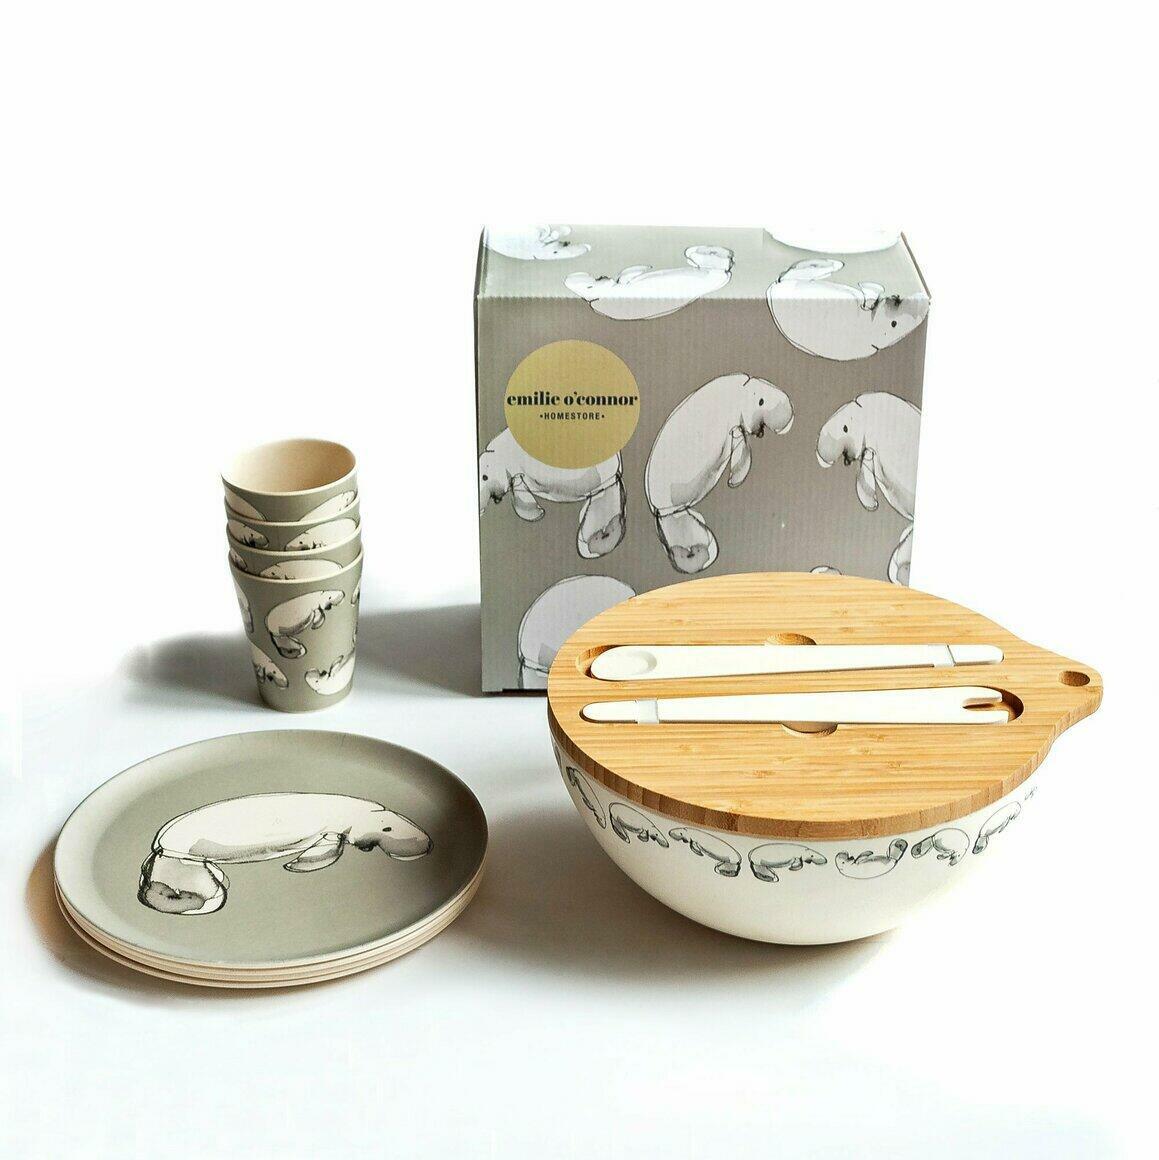 Dinnerware Gift Set with Dugong Design | Trada Marketplace